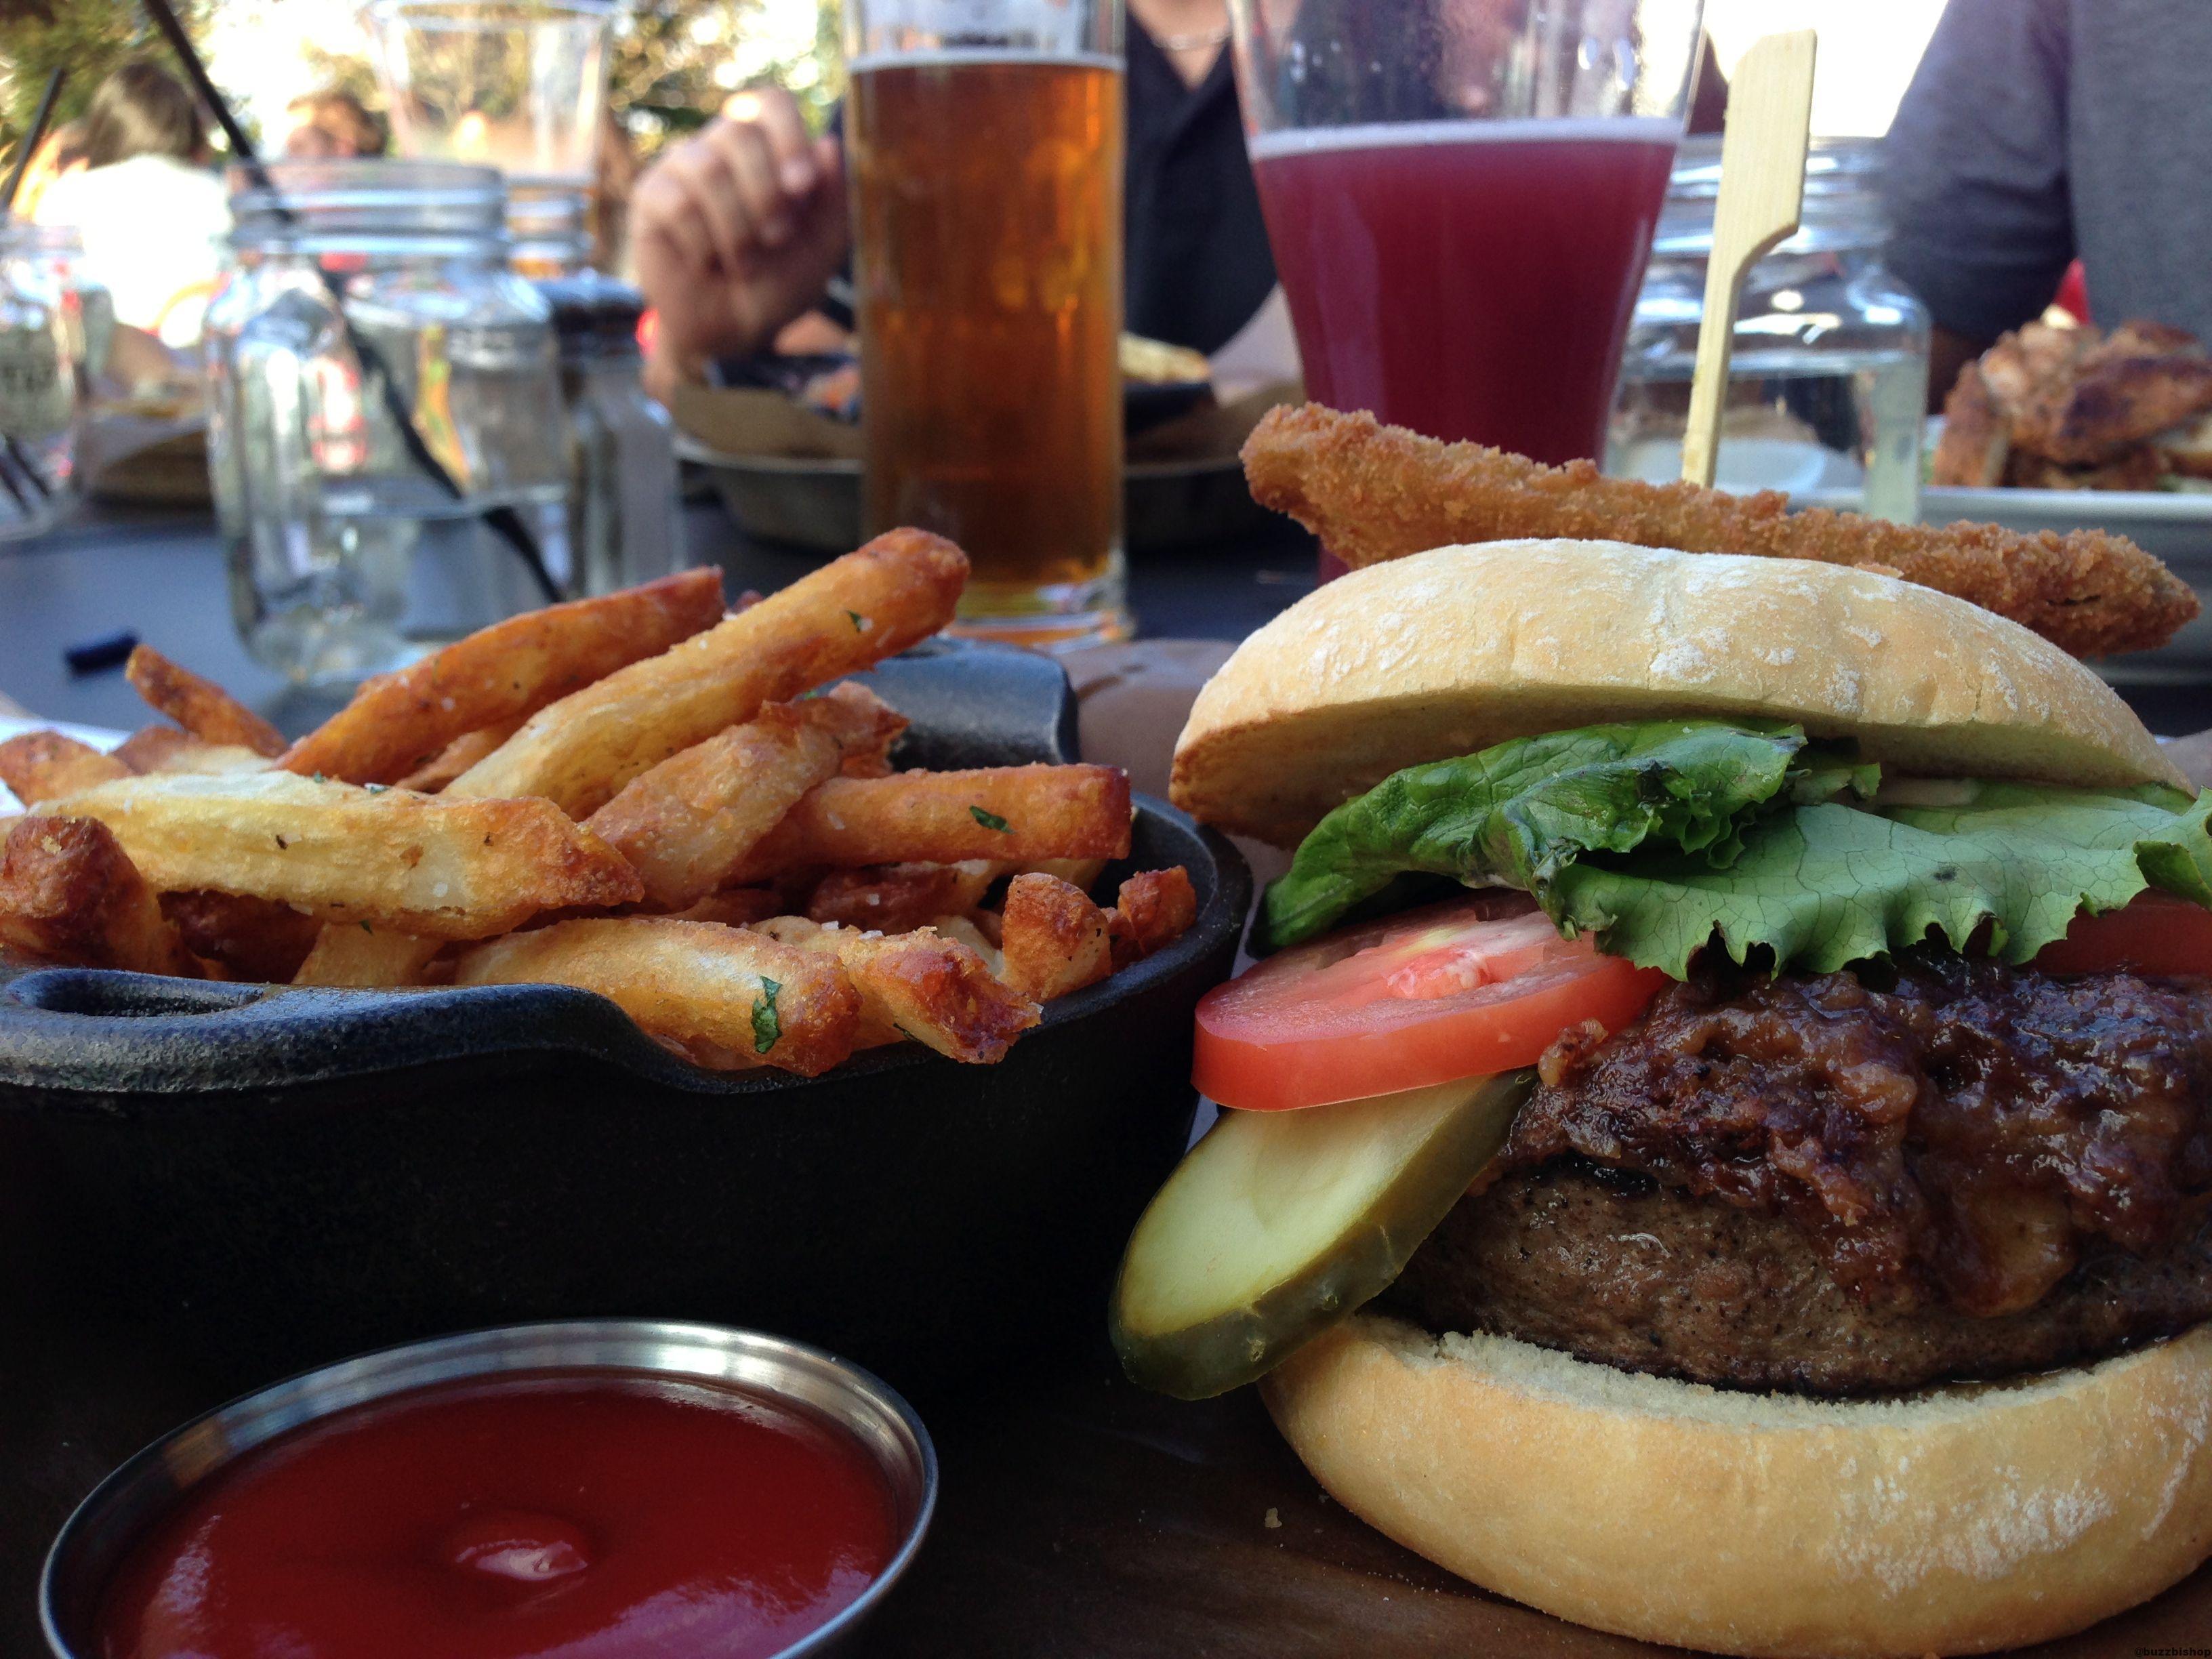 PB&J Burger at Tap and Barrel